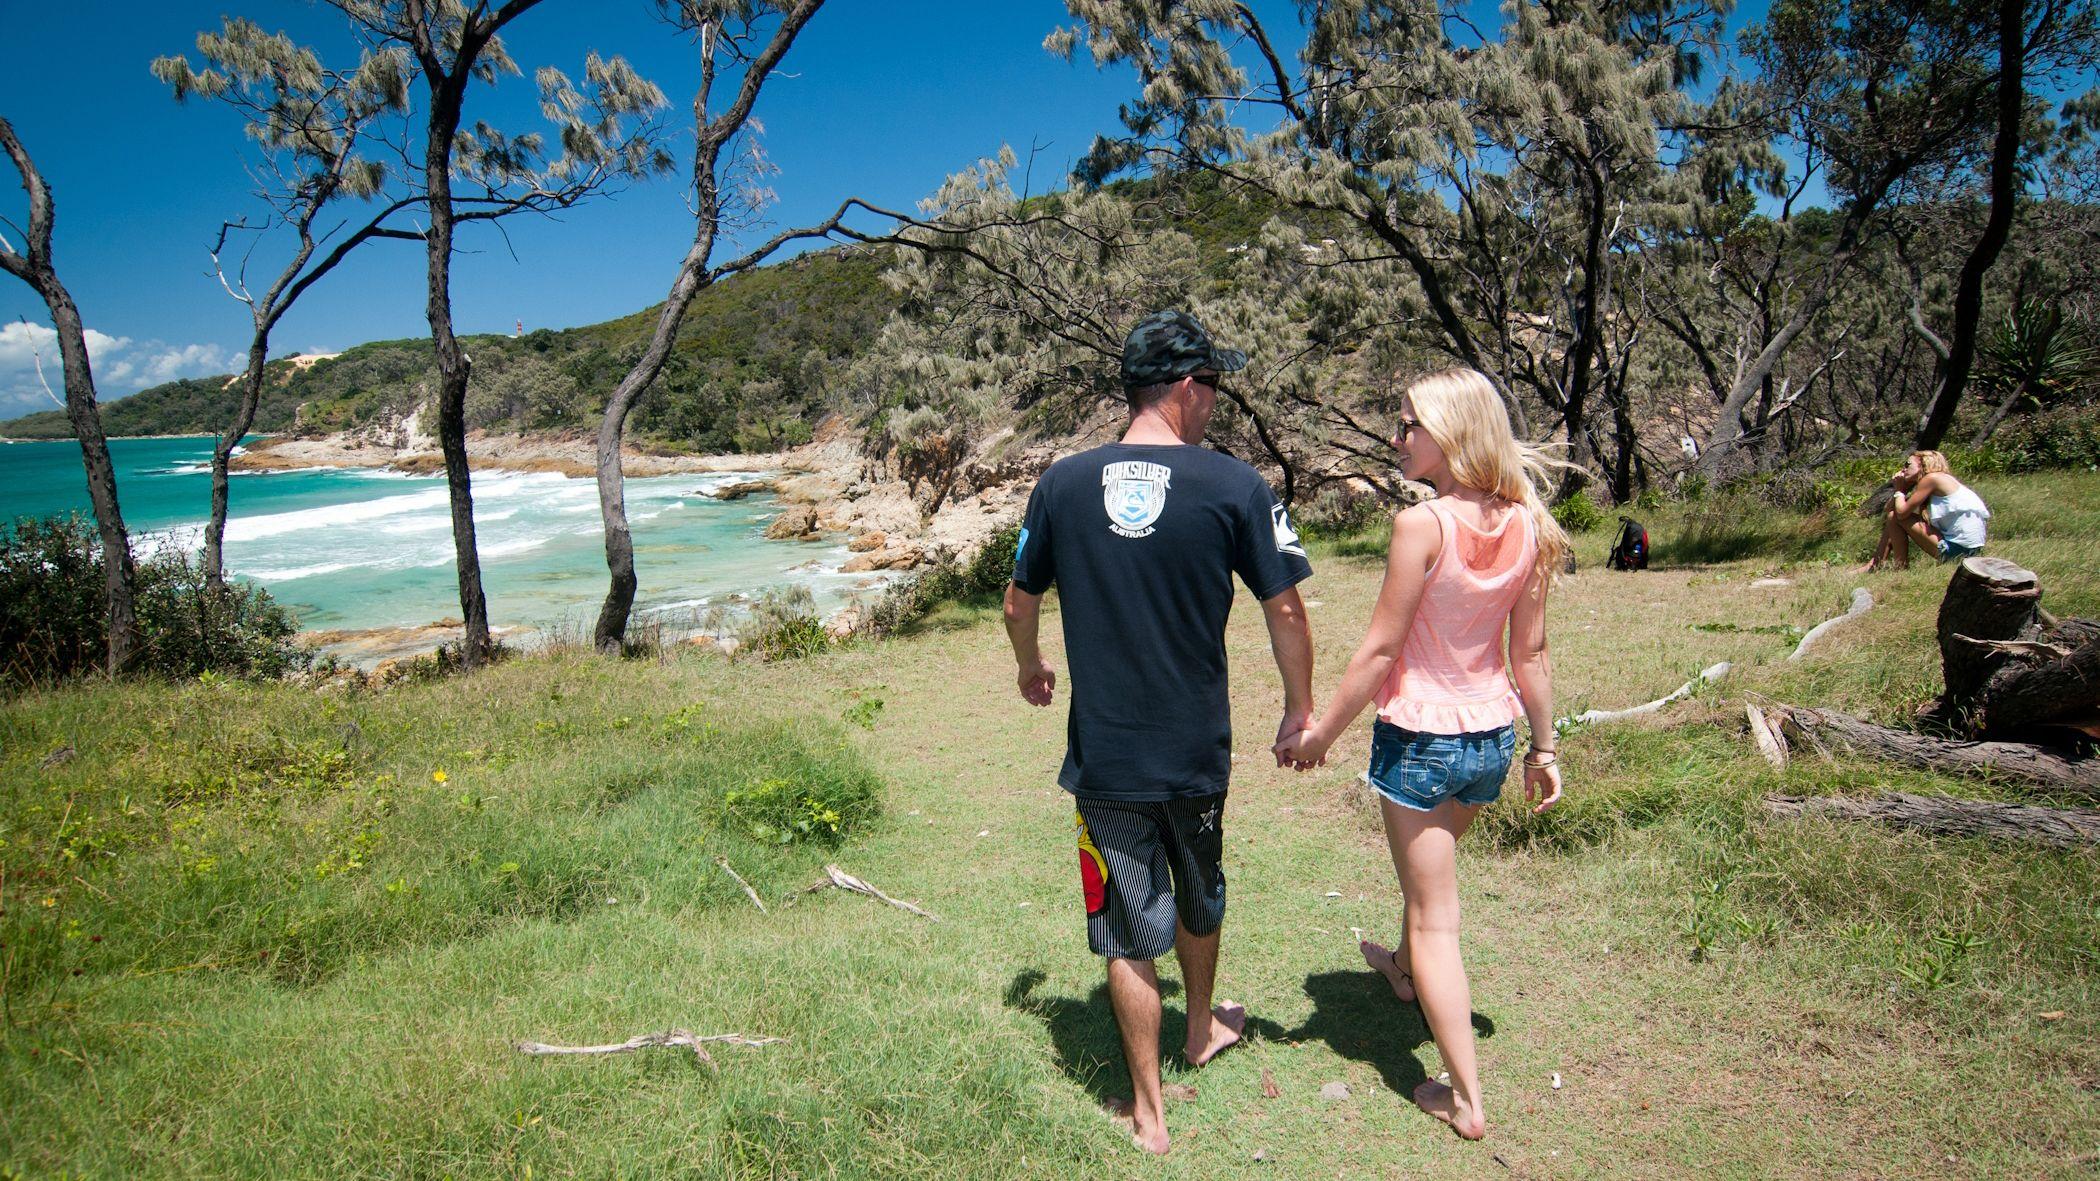 Full-Day Moreton Island 4x4 Sightseeing Tour